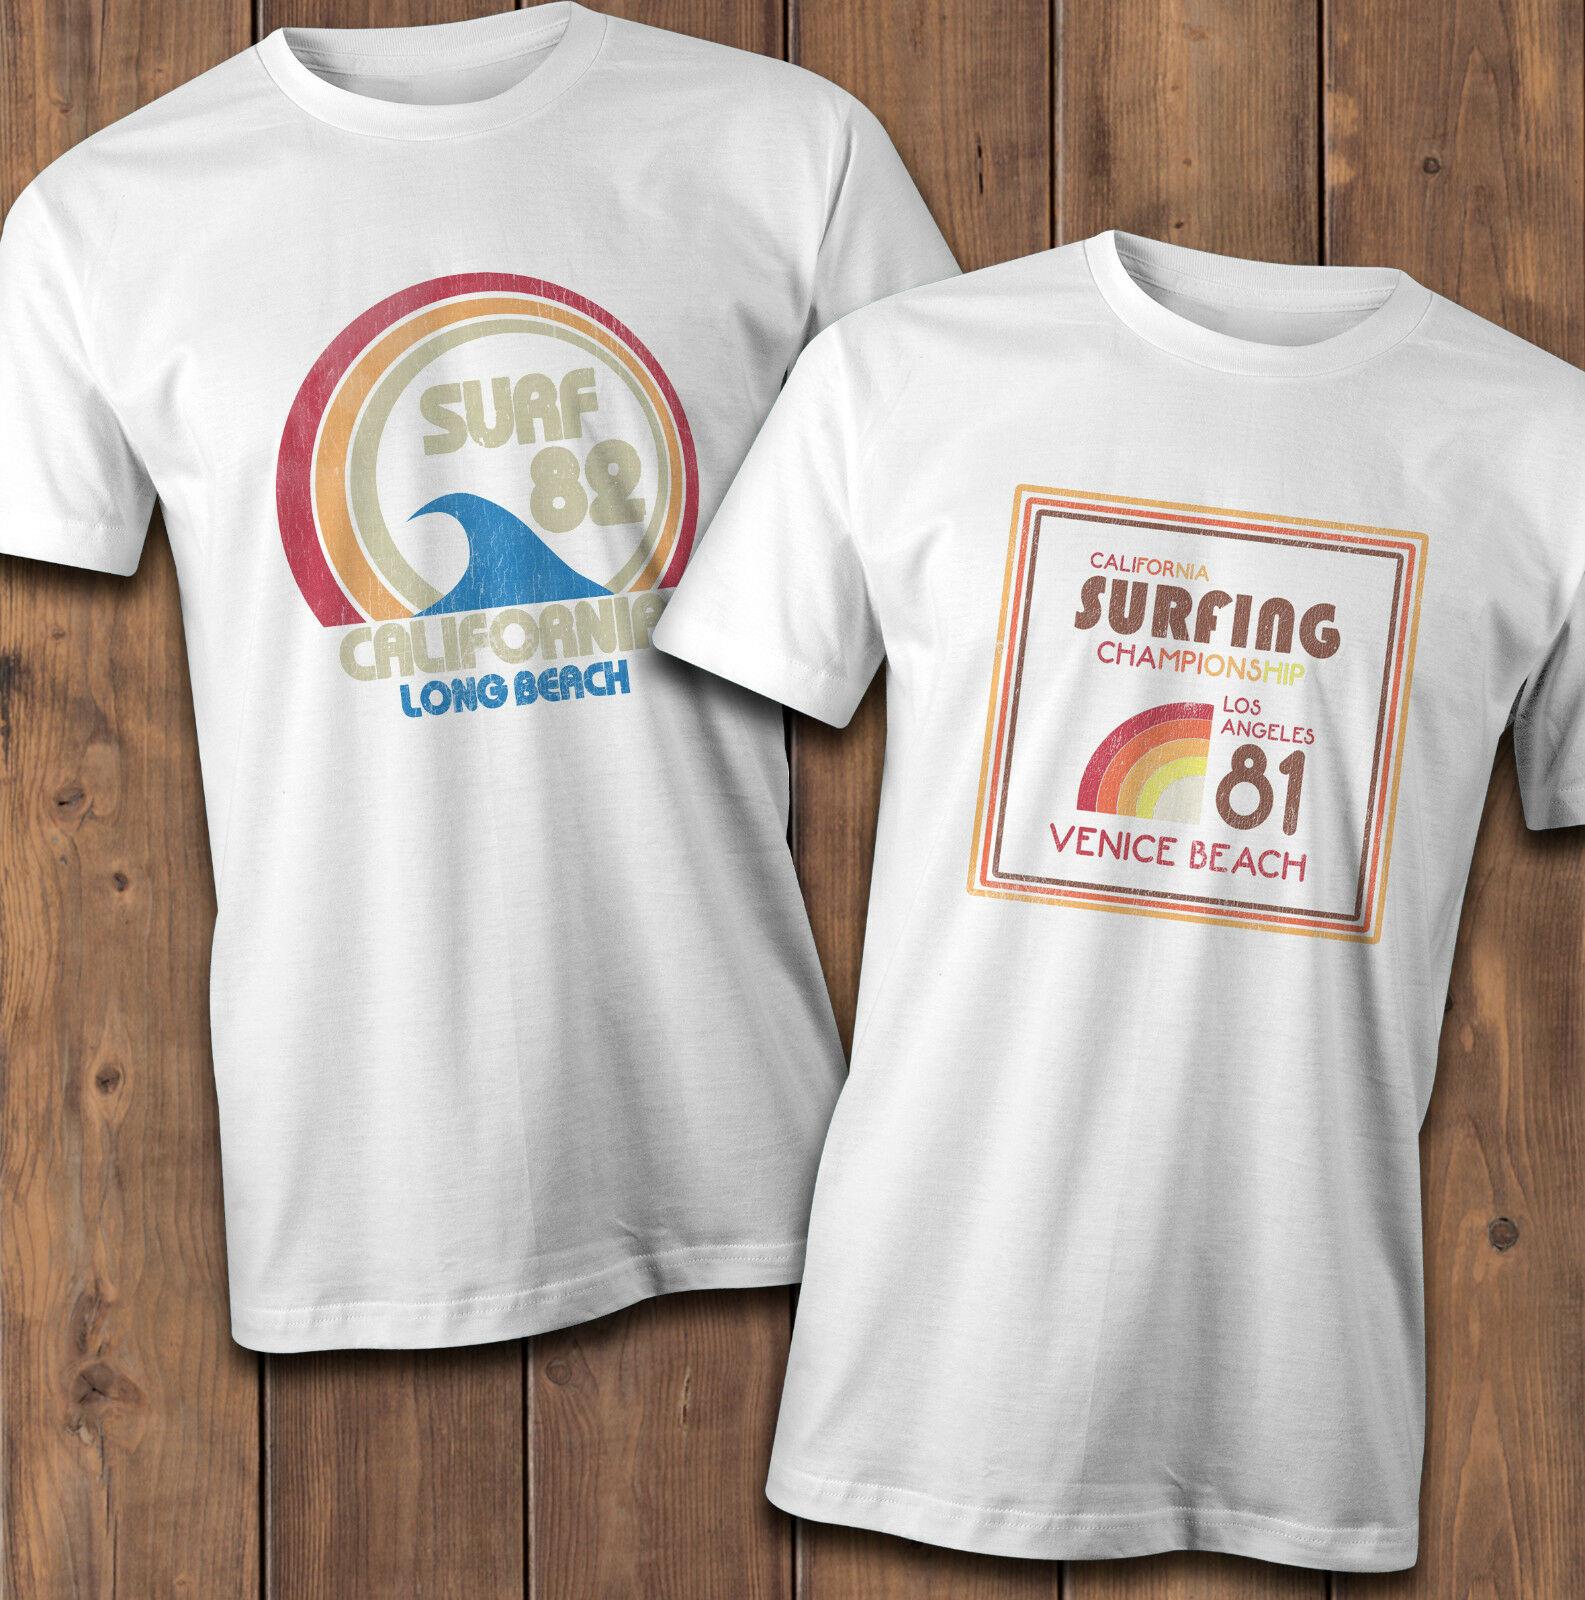 Camiseta de surf retro 1980, surf venice beach 82, surf 81. Vintage surf t homme 2019 novo casual de manga curta